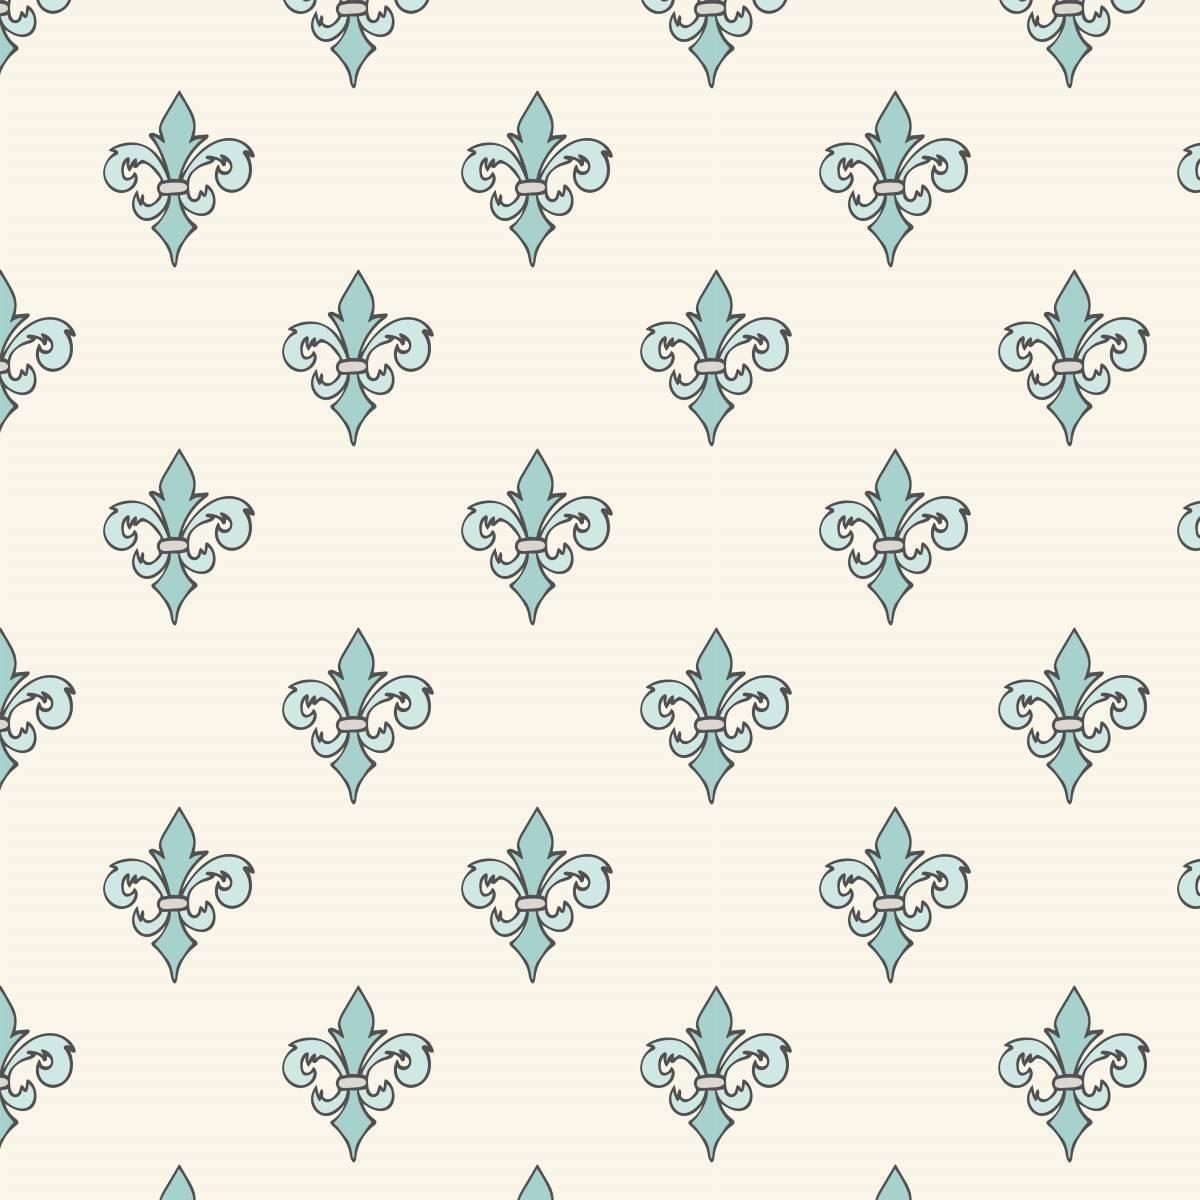 Papel de Parede Adesivo Vintage Azul/Branco Rolo - Redecorei